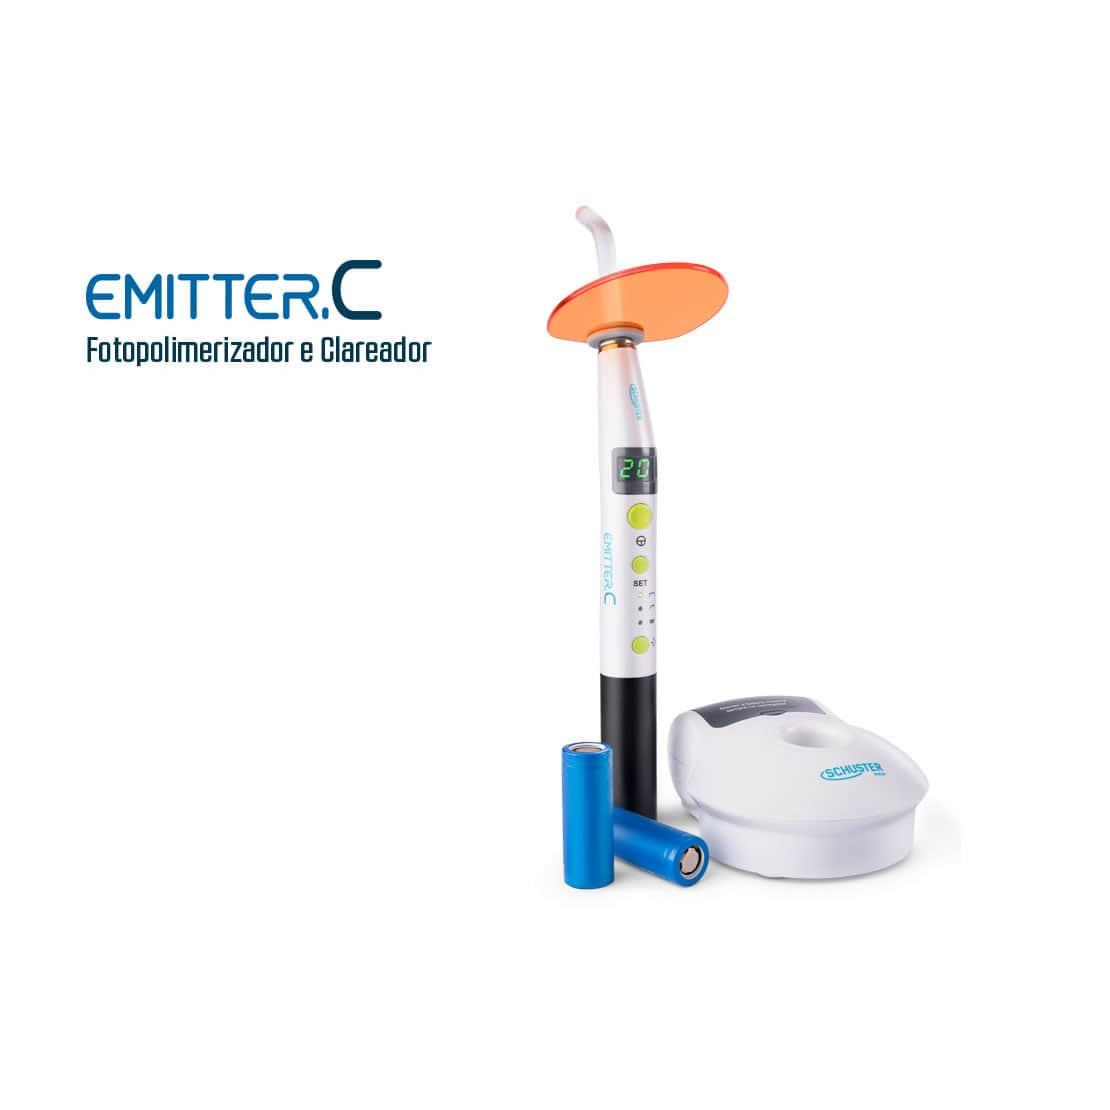 Fotopolimerizador Emitter C Wireless (Sem fio) - Schuster